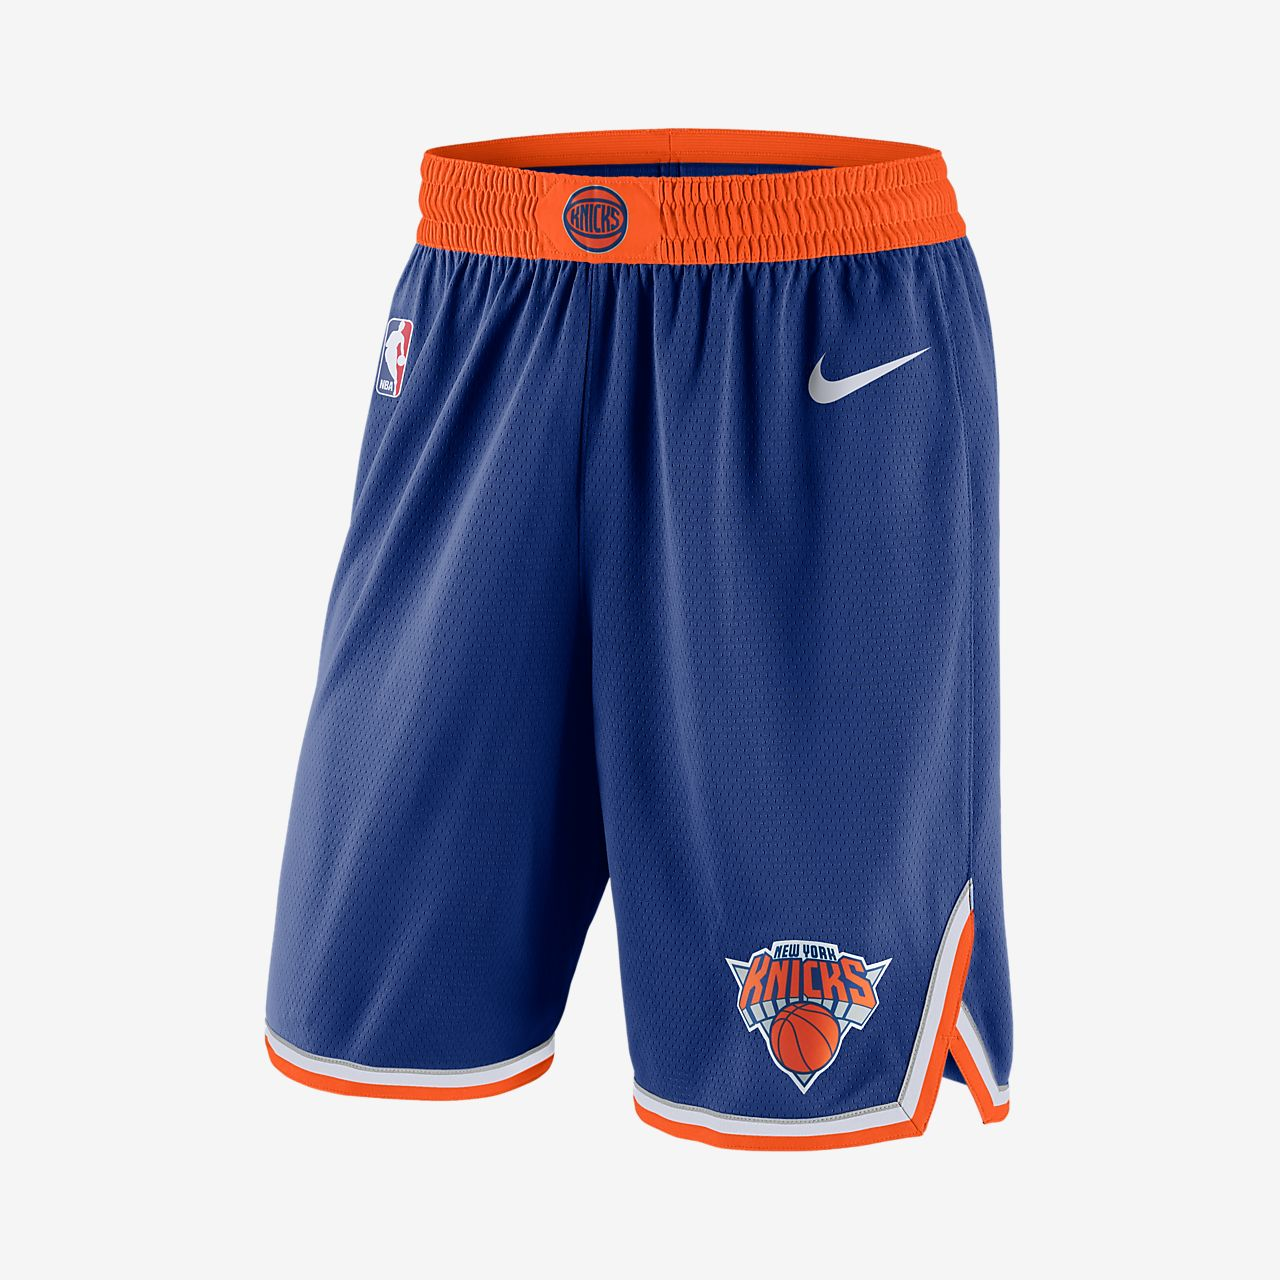 Shorts NBA New York Knicks Nike Icon Edition Swingman - Uomo